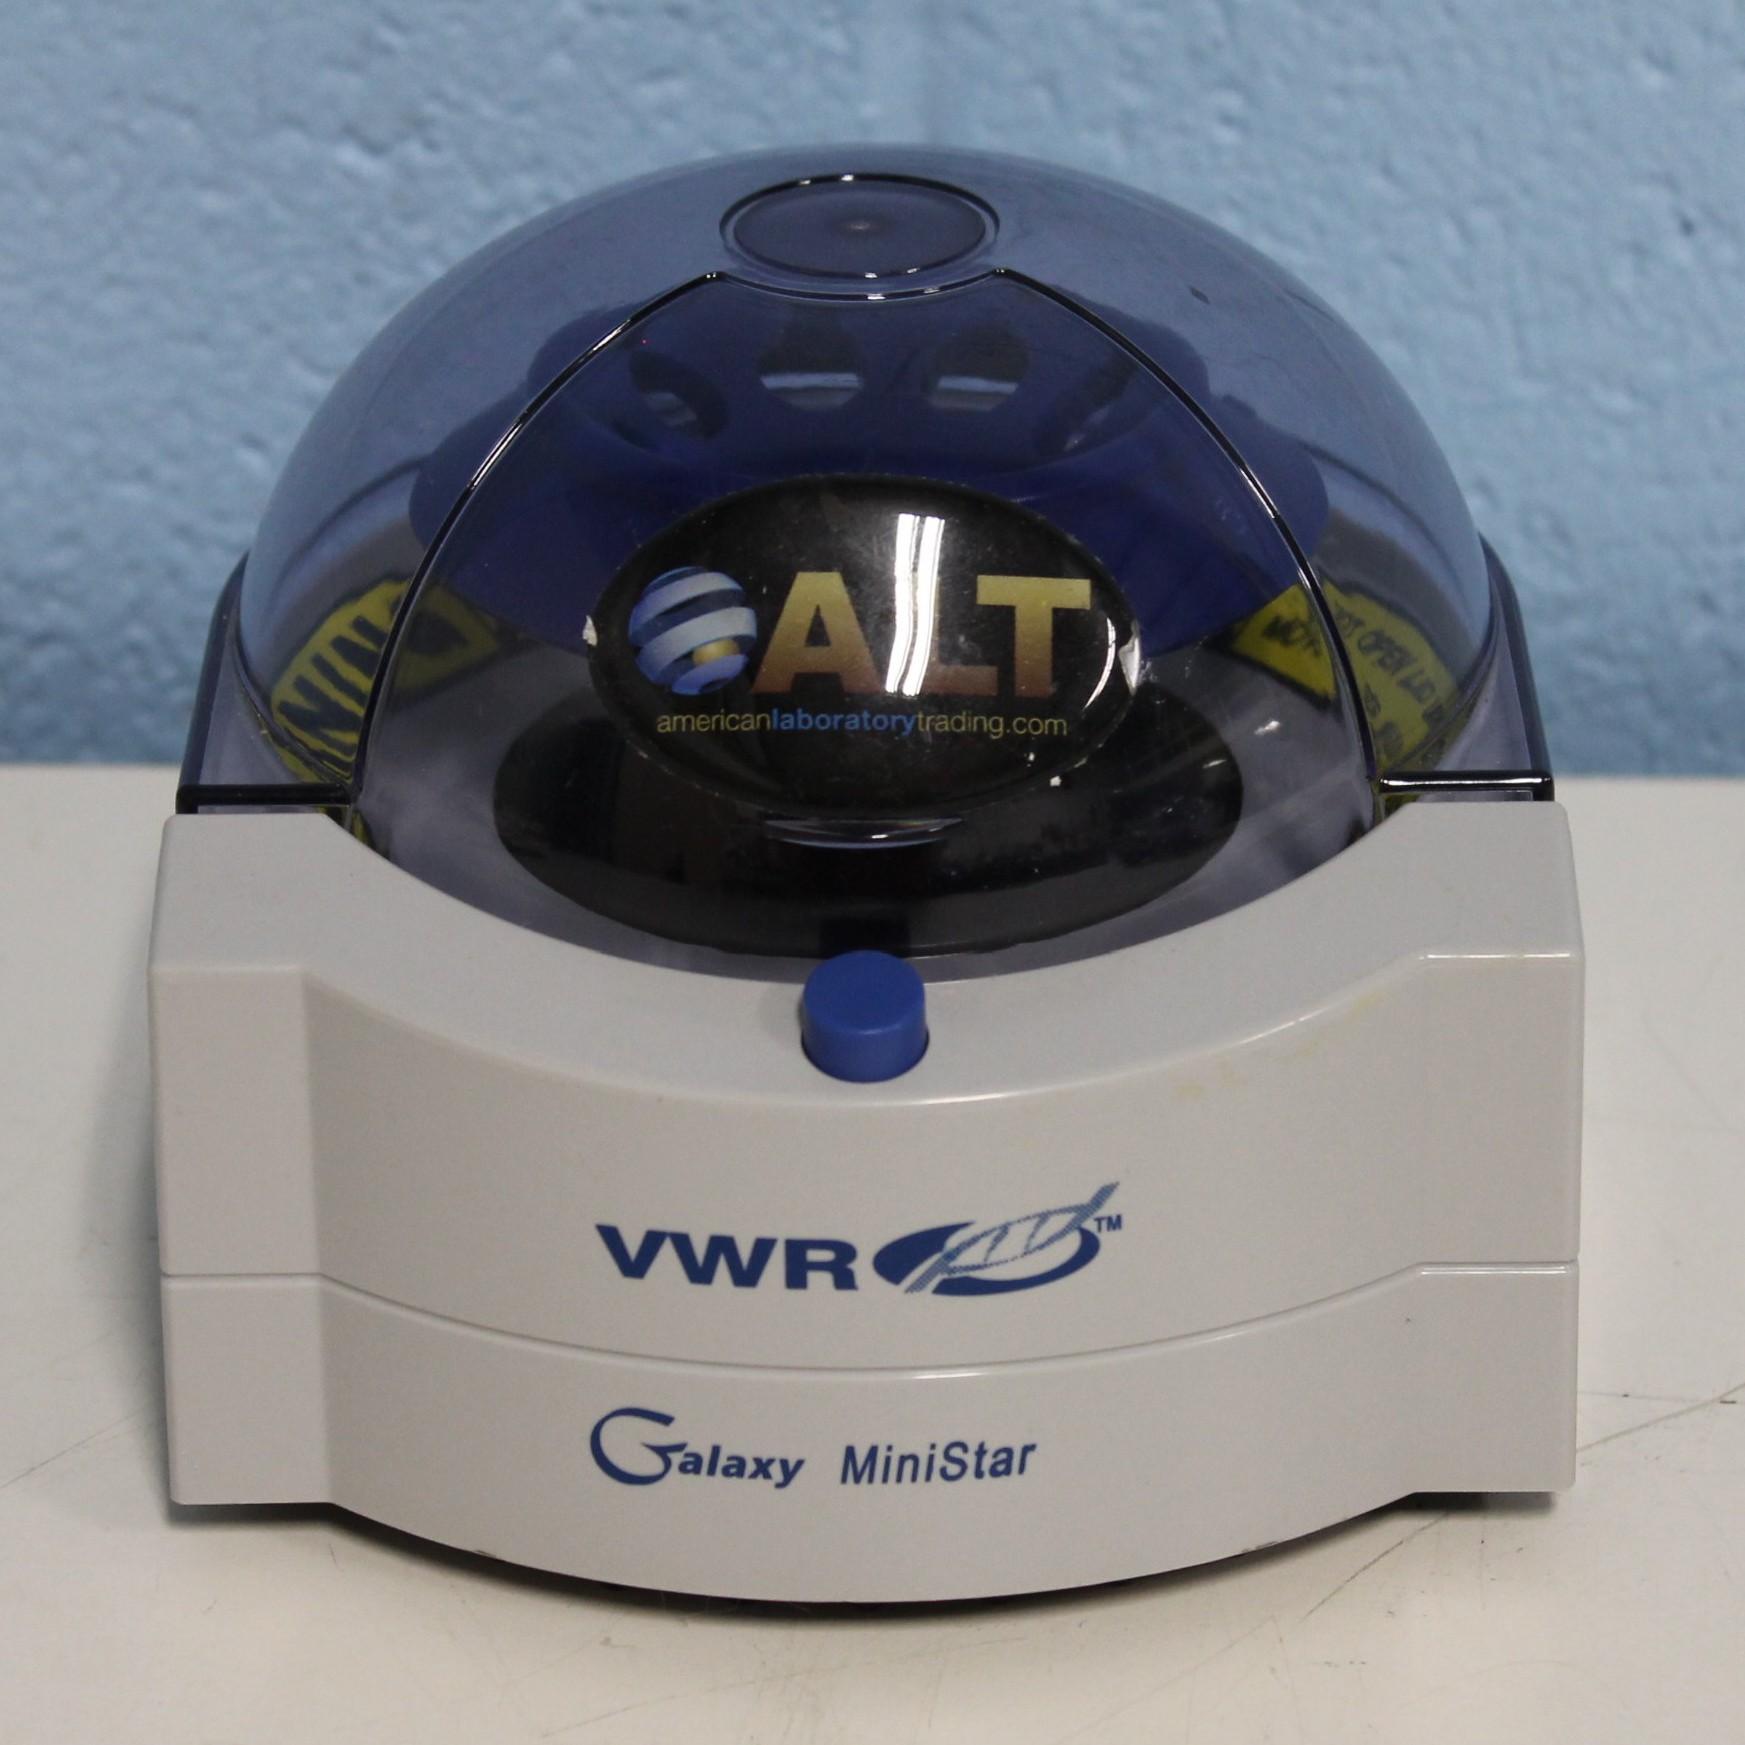 Galaxy MiniStar Microcentrifuge C1413 Name